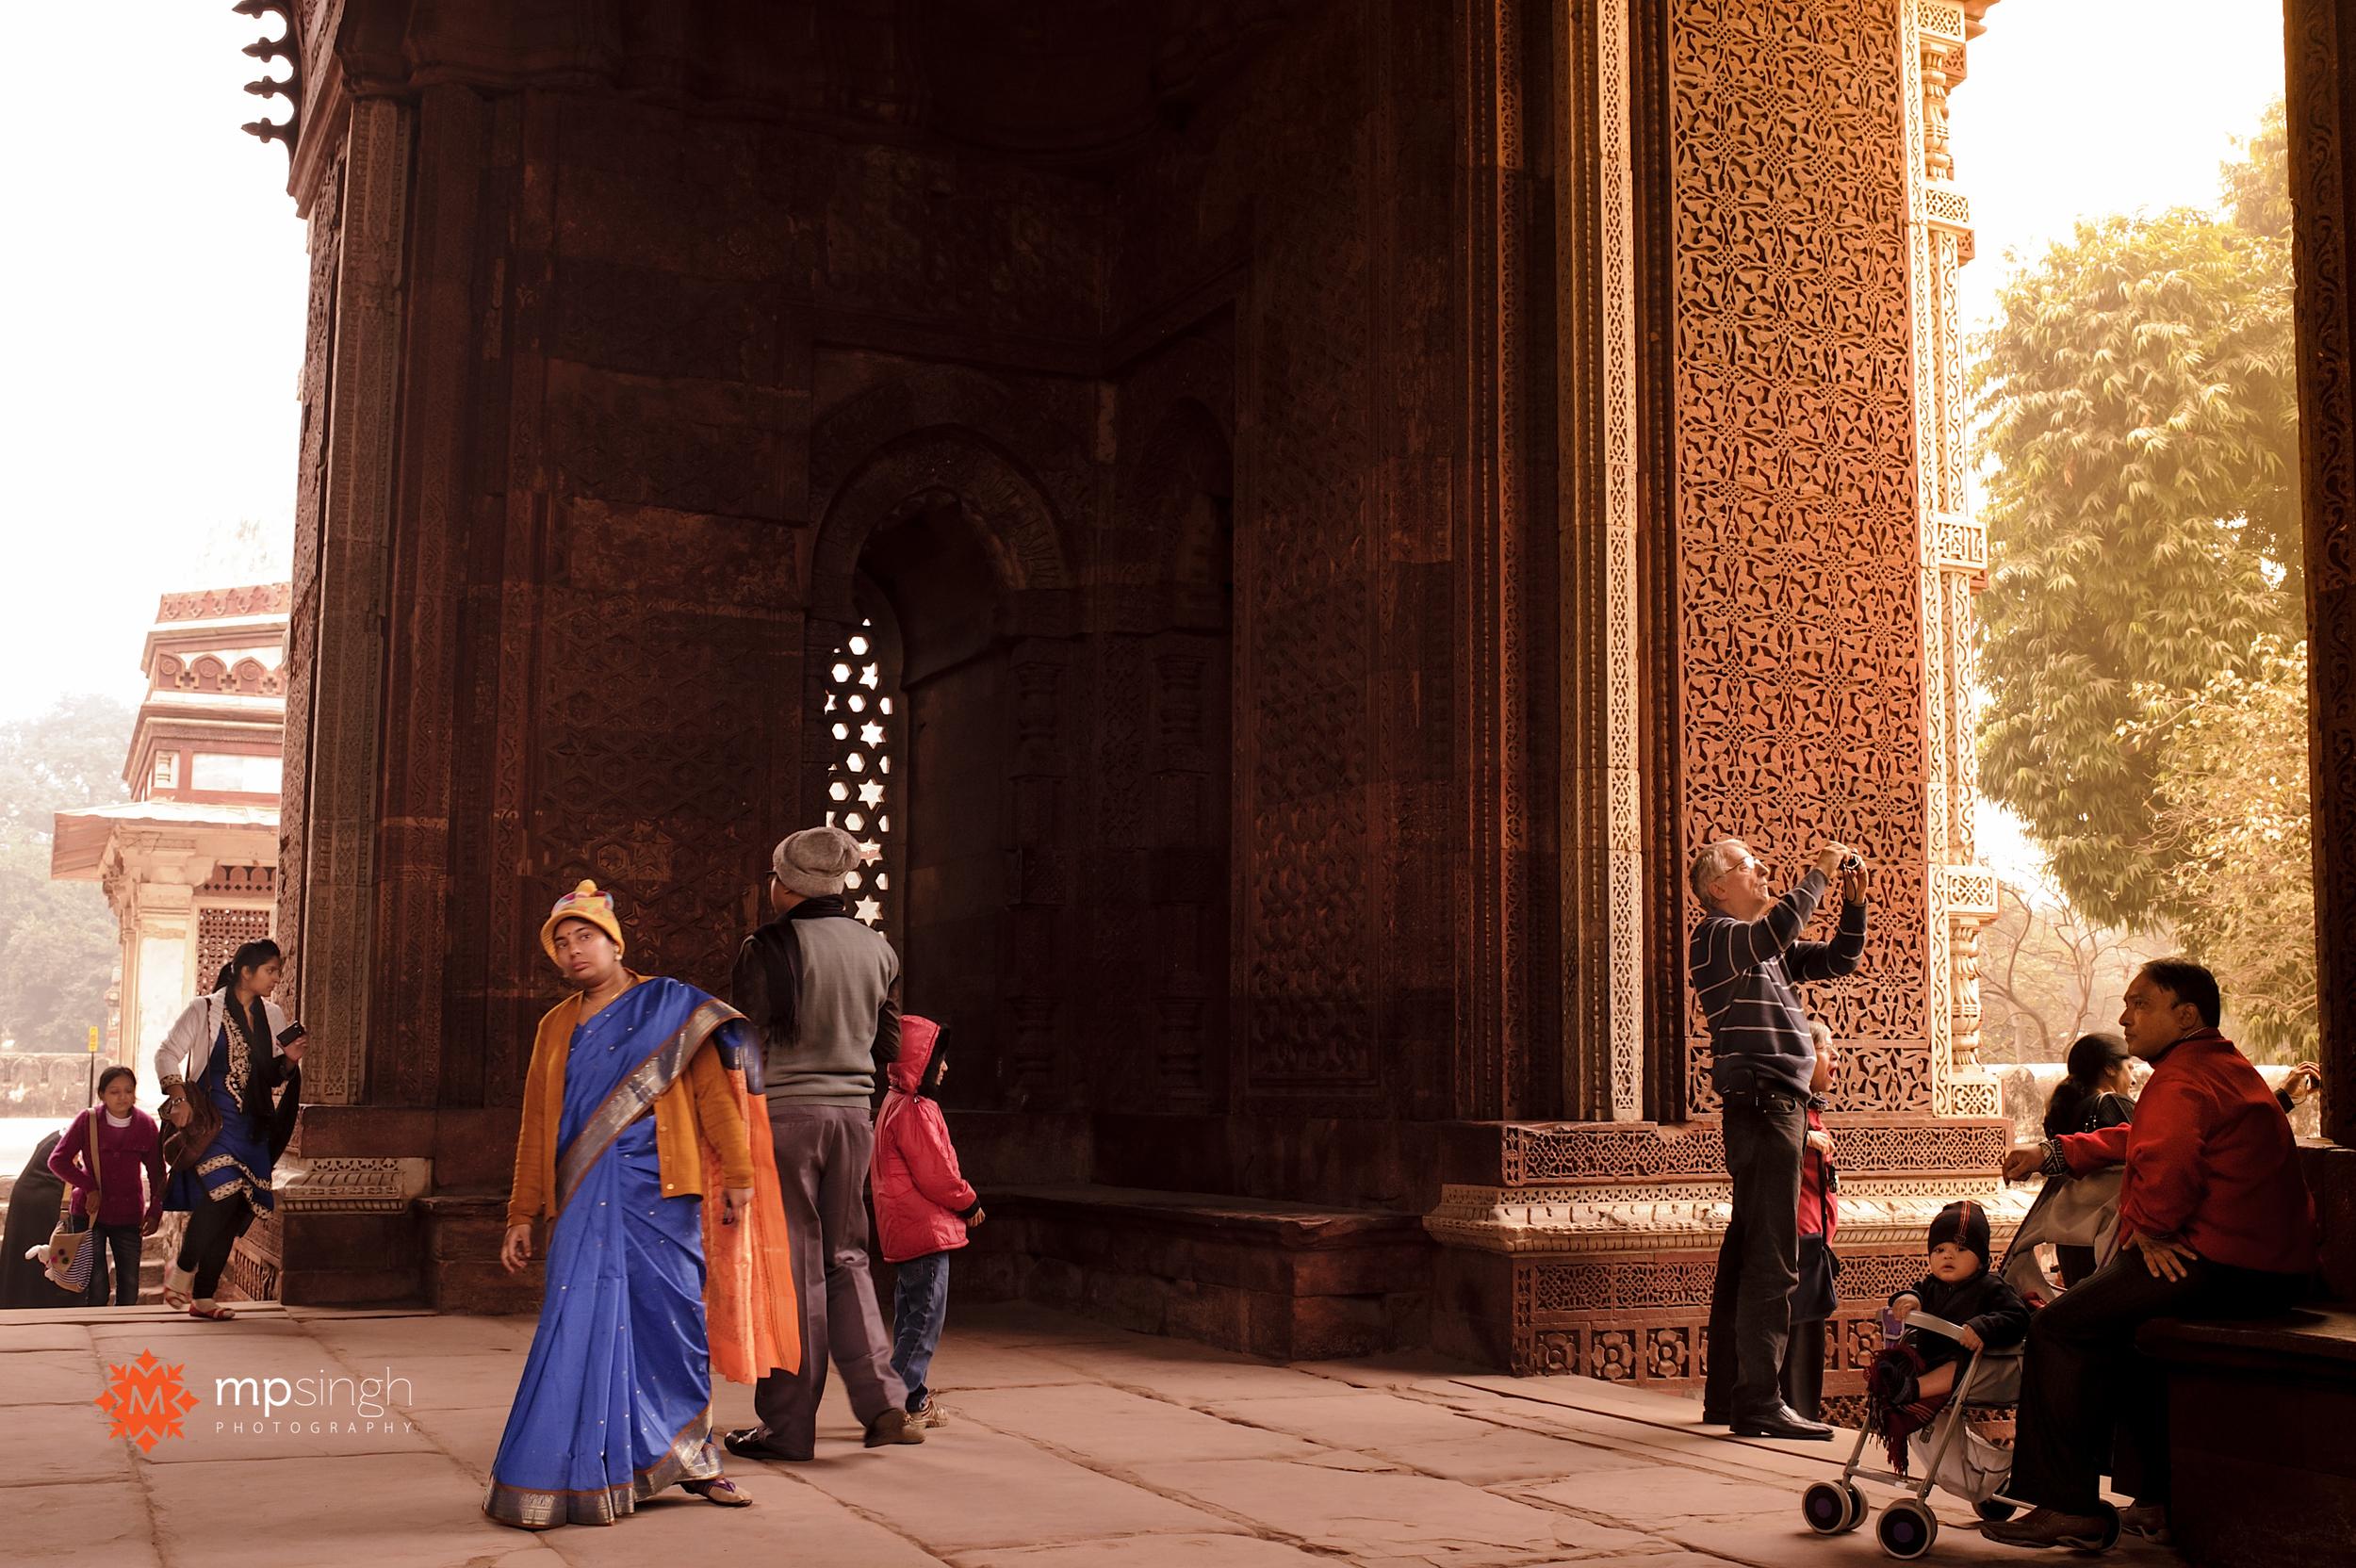 Qutub Minar MP Singh Photography